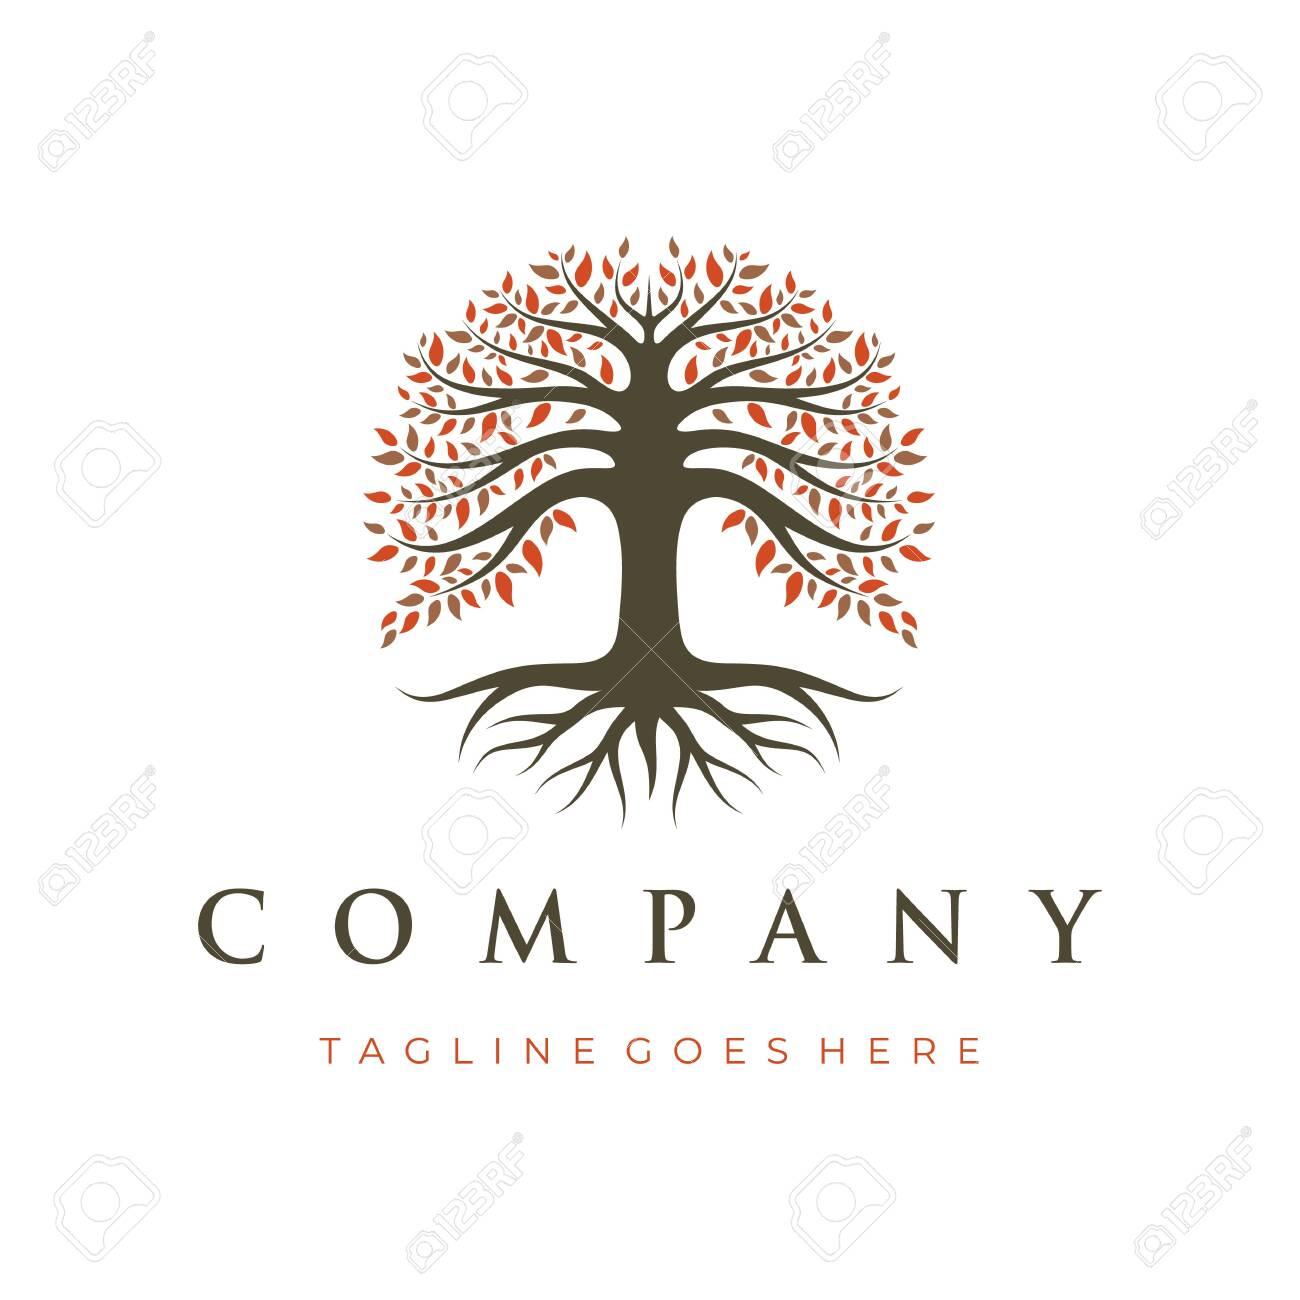 Tree Of Life Oak Banyan Tree Logo Design Template Royalty Free Cliparts Vectors And Stock Illustration Image 150110861